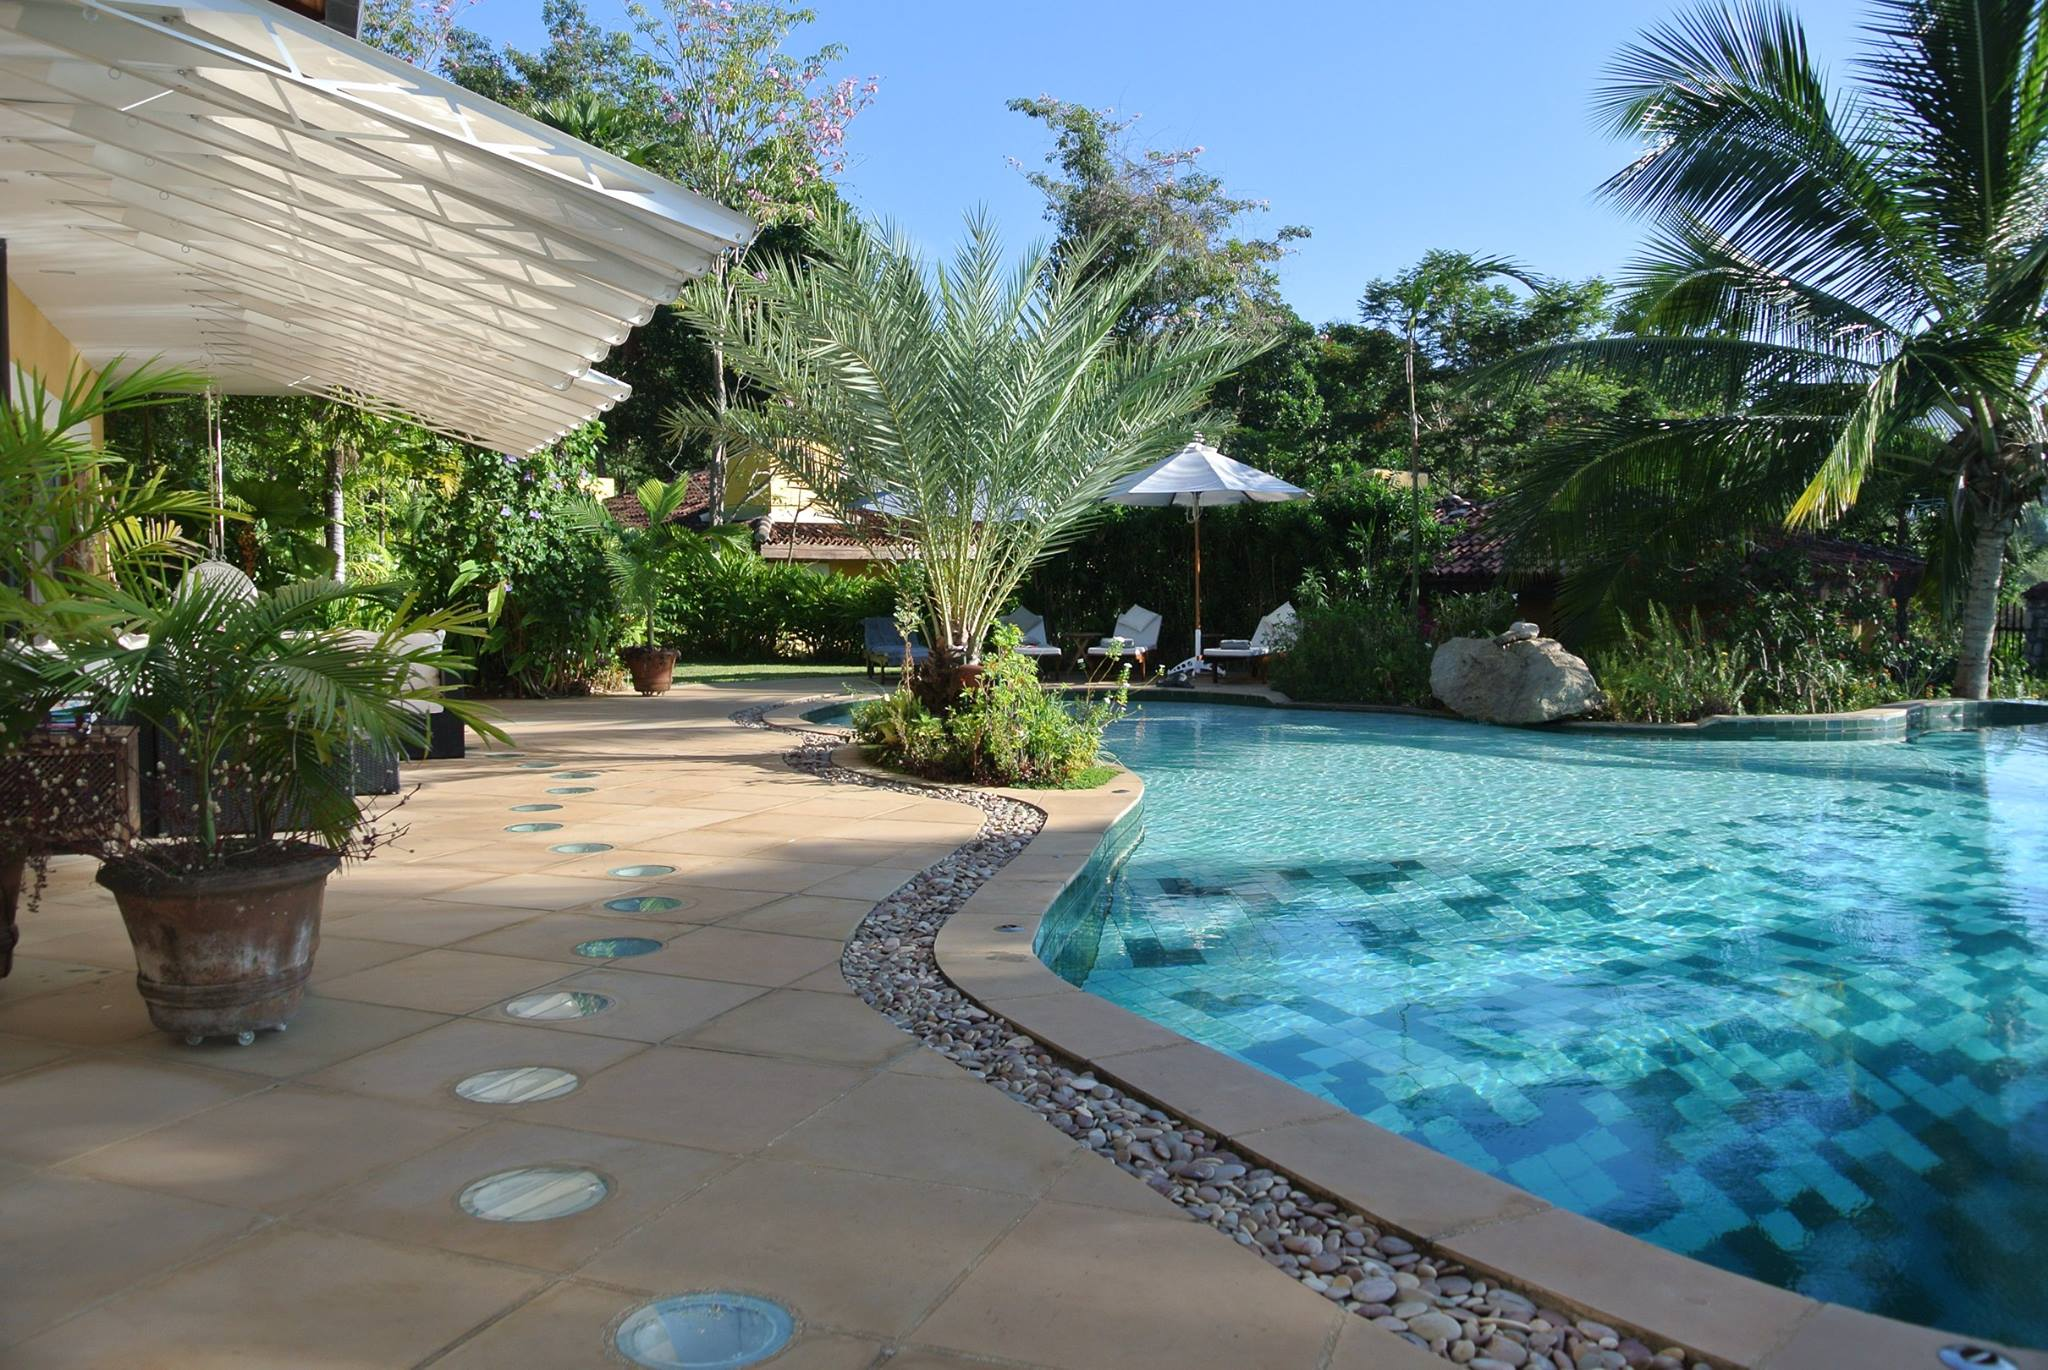 bougainvillea-retreat-center-rajawella-kandy-9